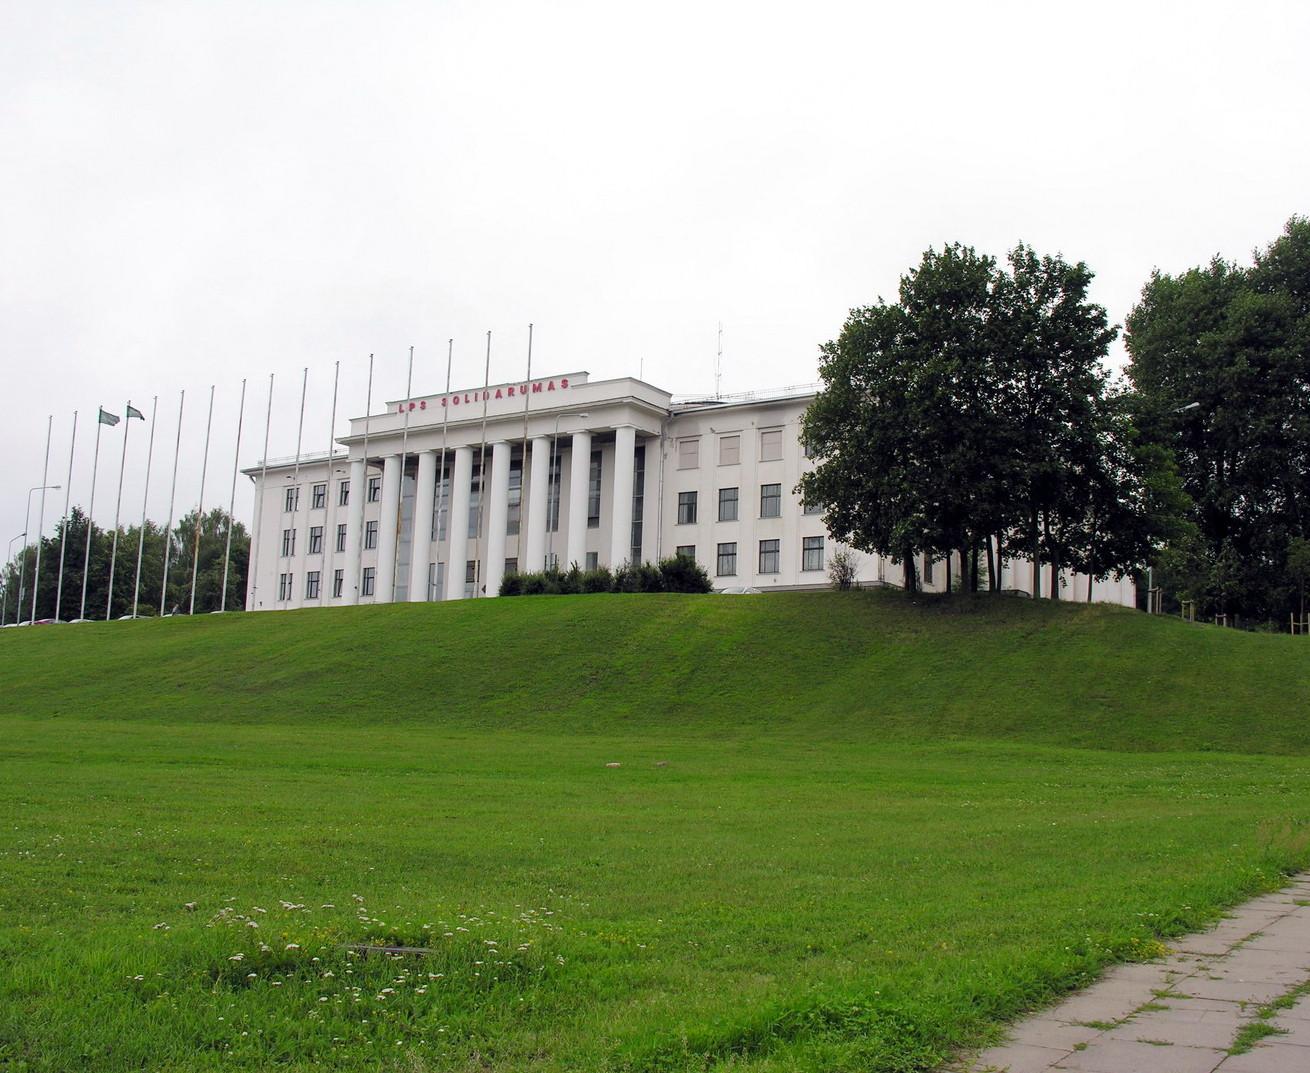 Buvę Profsąjungų rūmai ant Tauro kalno Vilniuje | wikimedia.org nuotr.